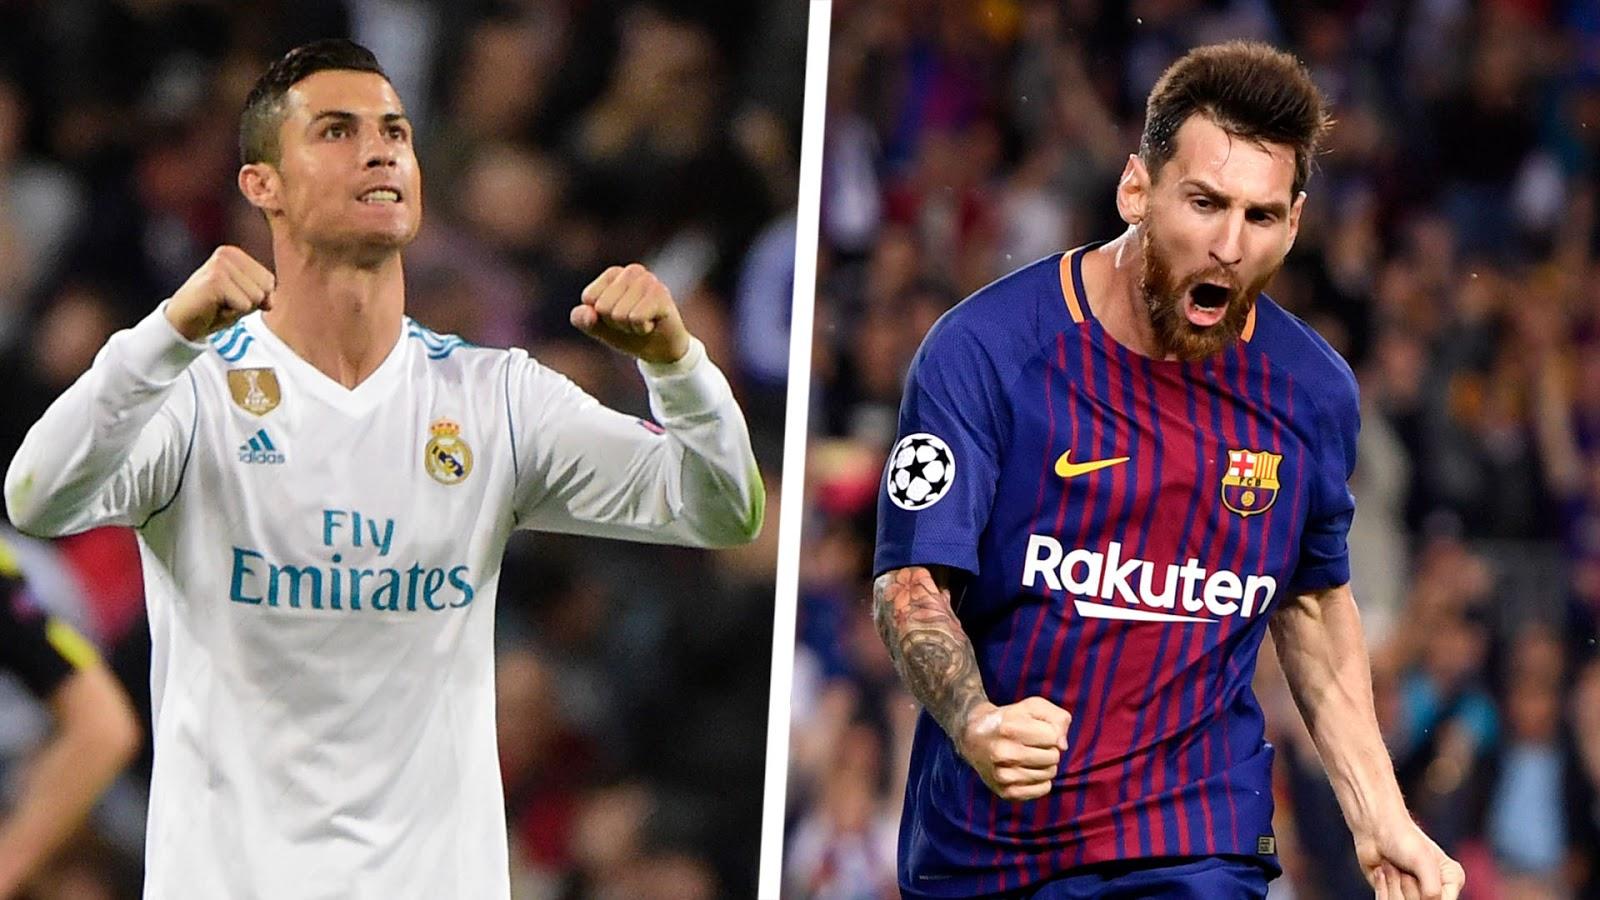 Messi-khong-co-hung-thu-canh-tranh-voi-Ronaldo